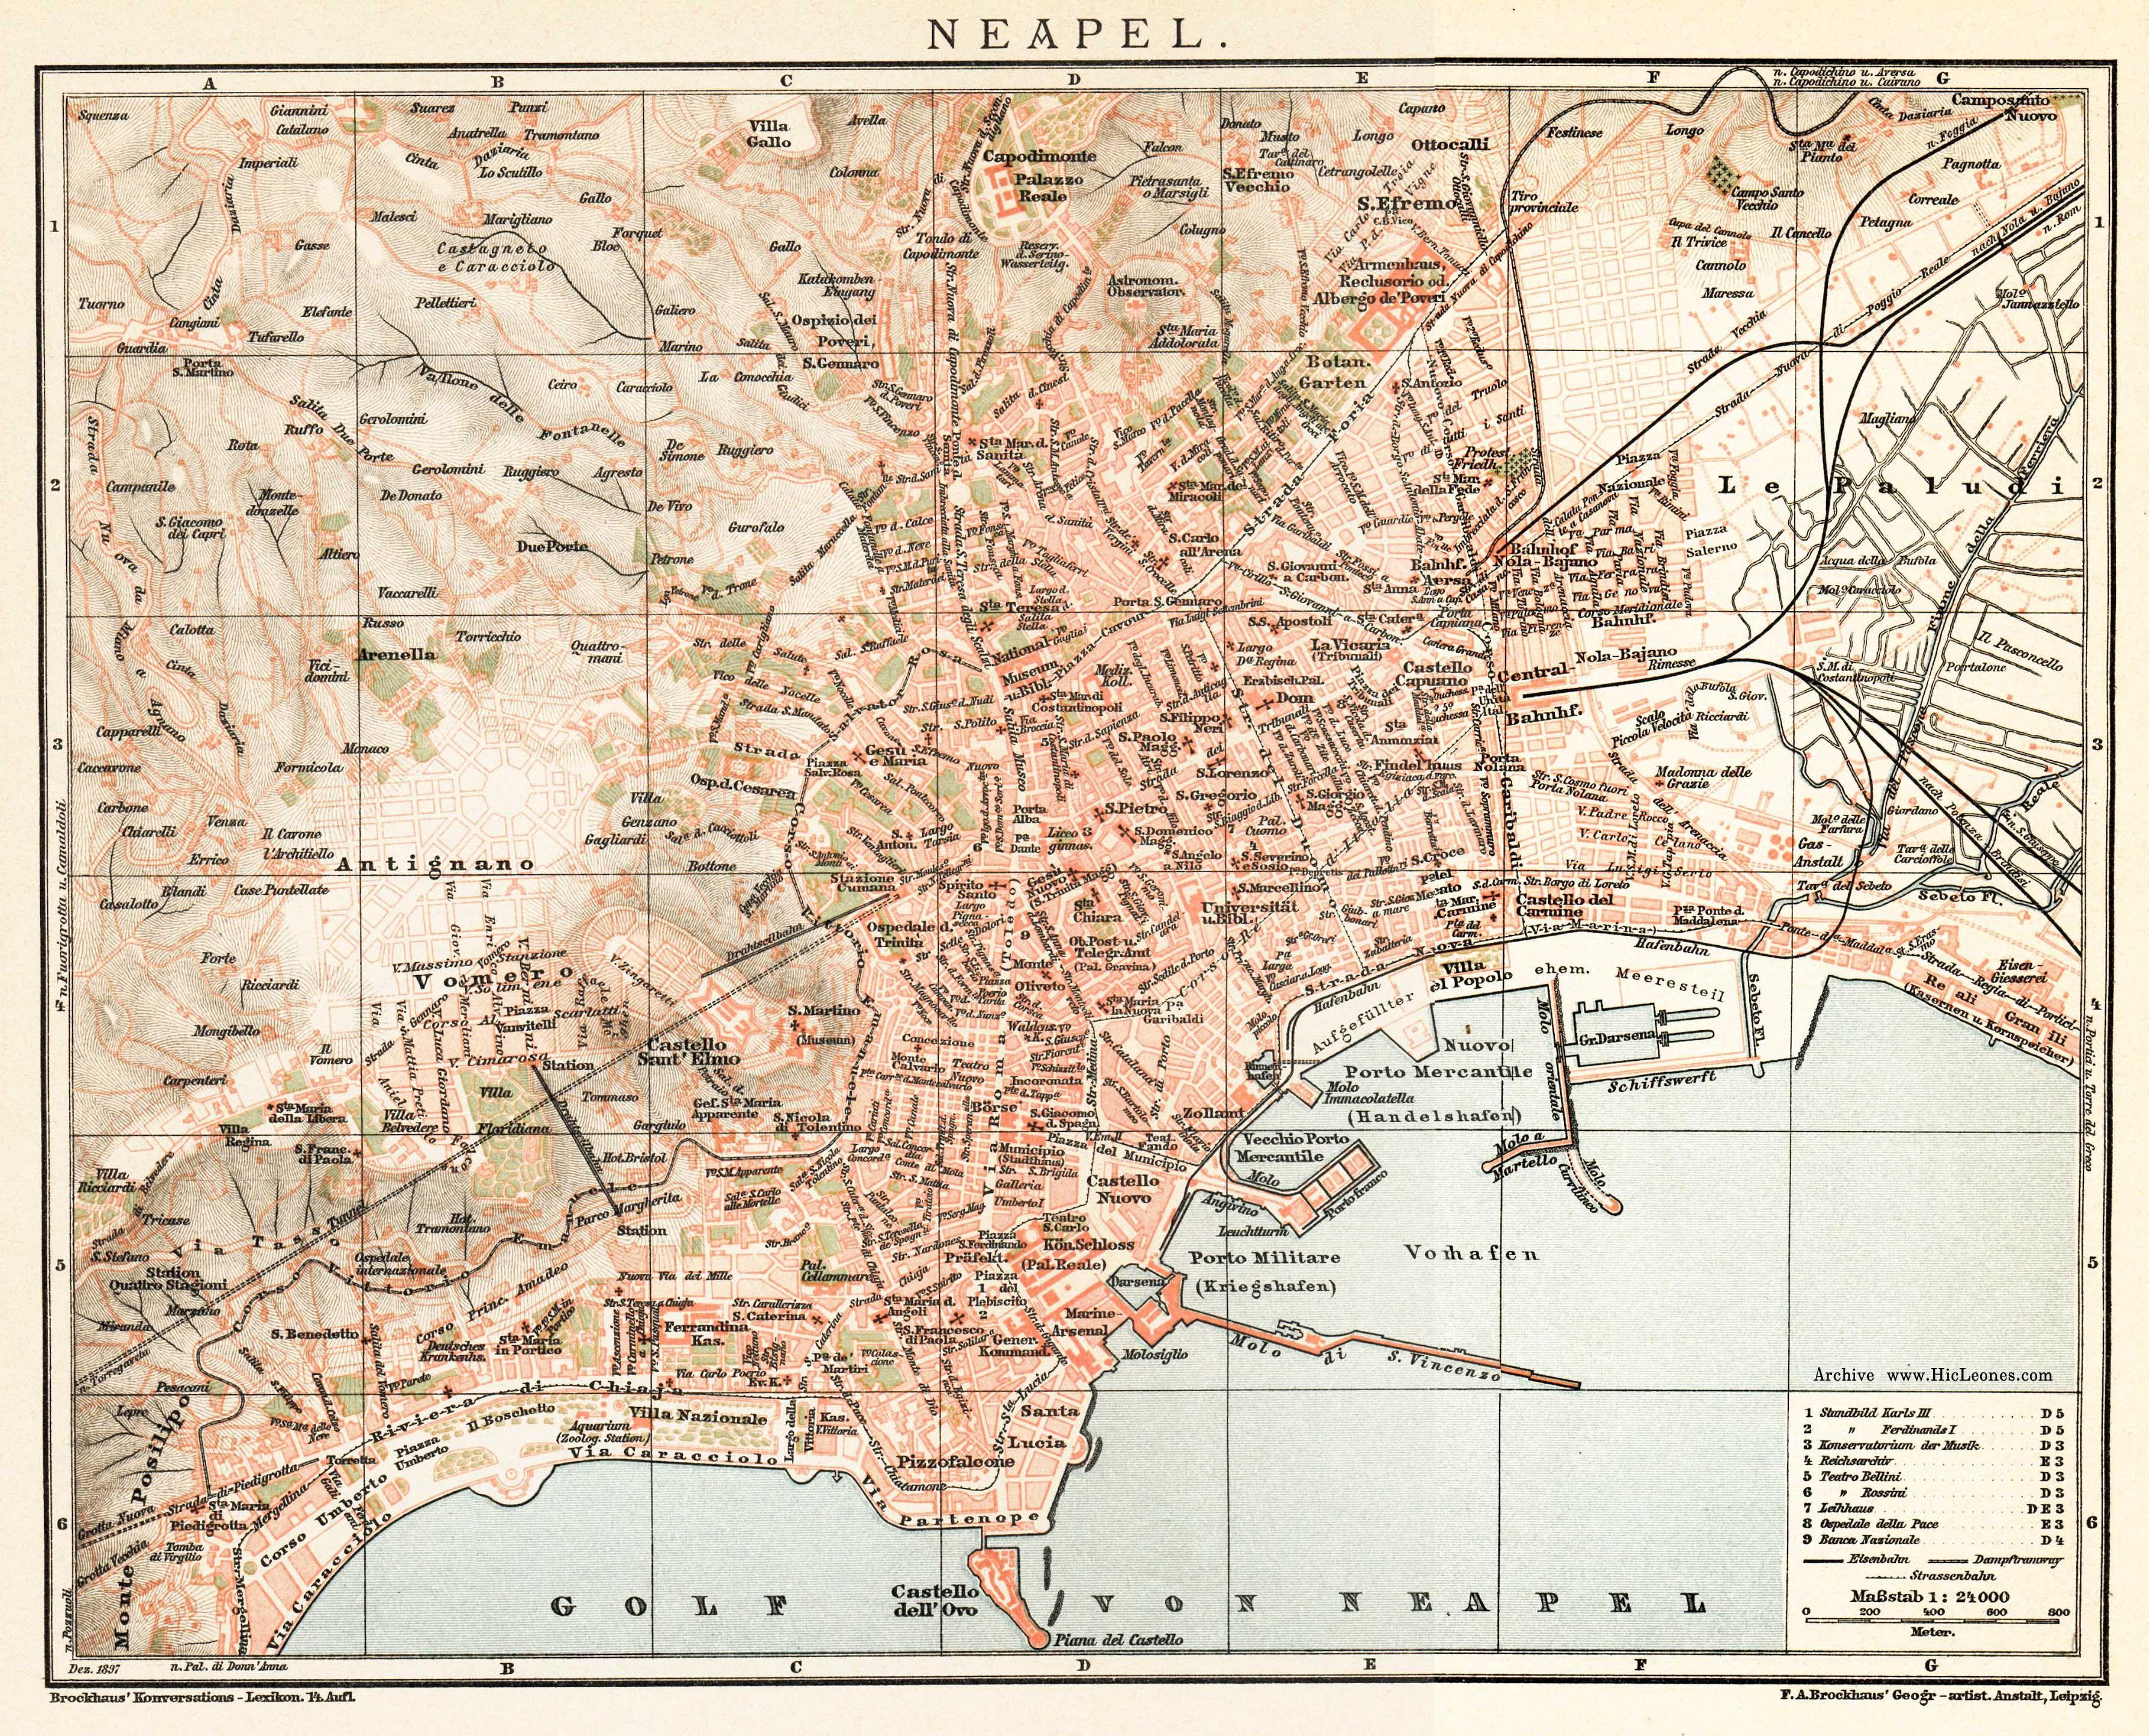 Naples/Napoli - City / Ville | Maps | Antique maps, Italy, Naples